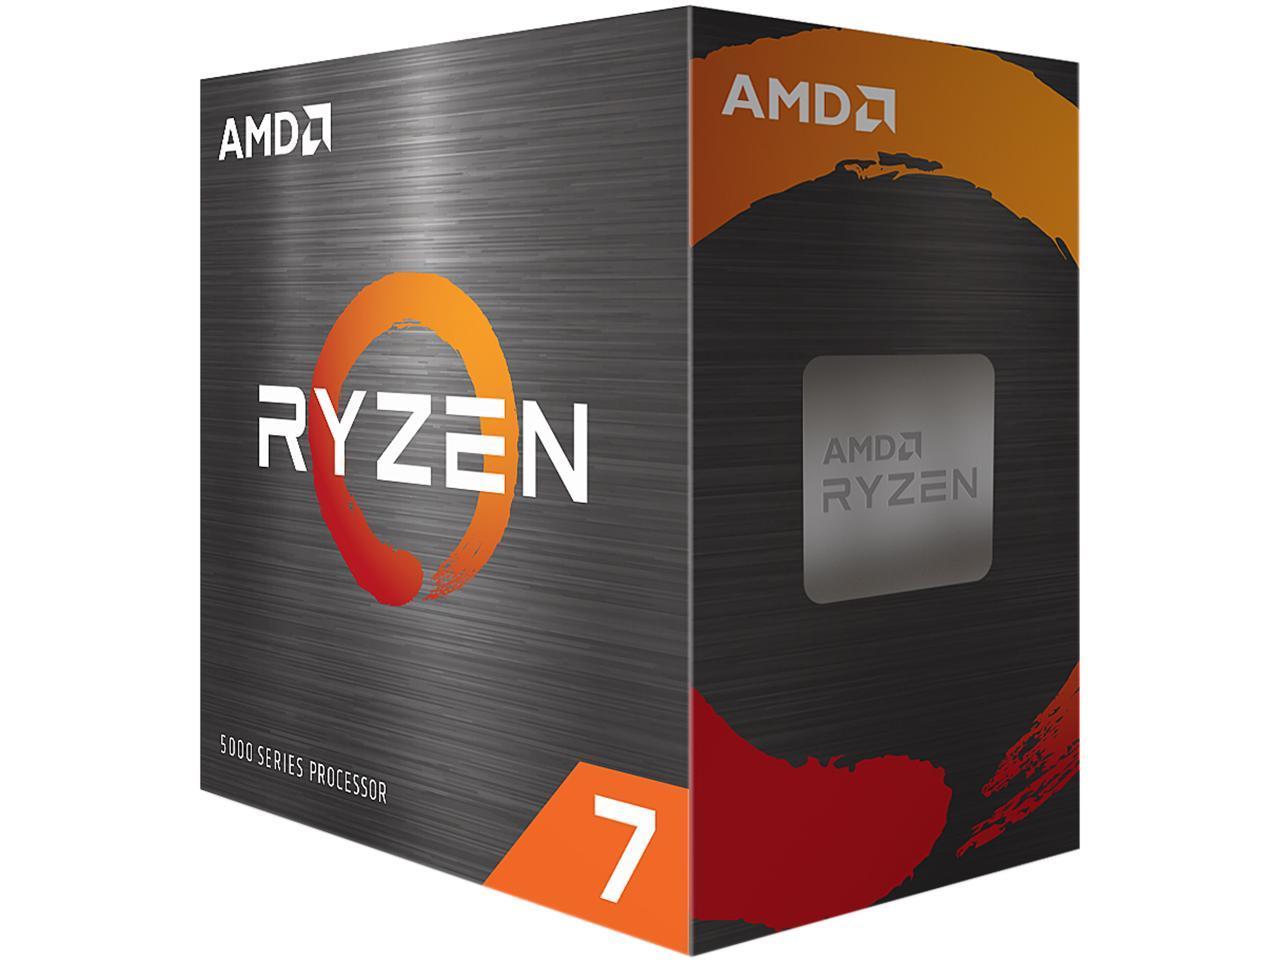 AMD Ryzen 7 5800X AM4 Processor @Newegg $429